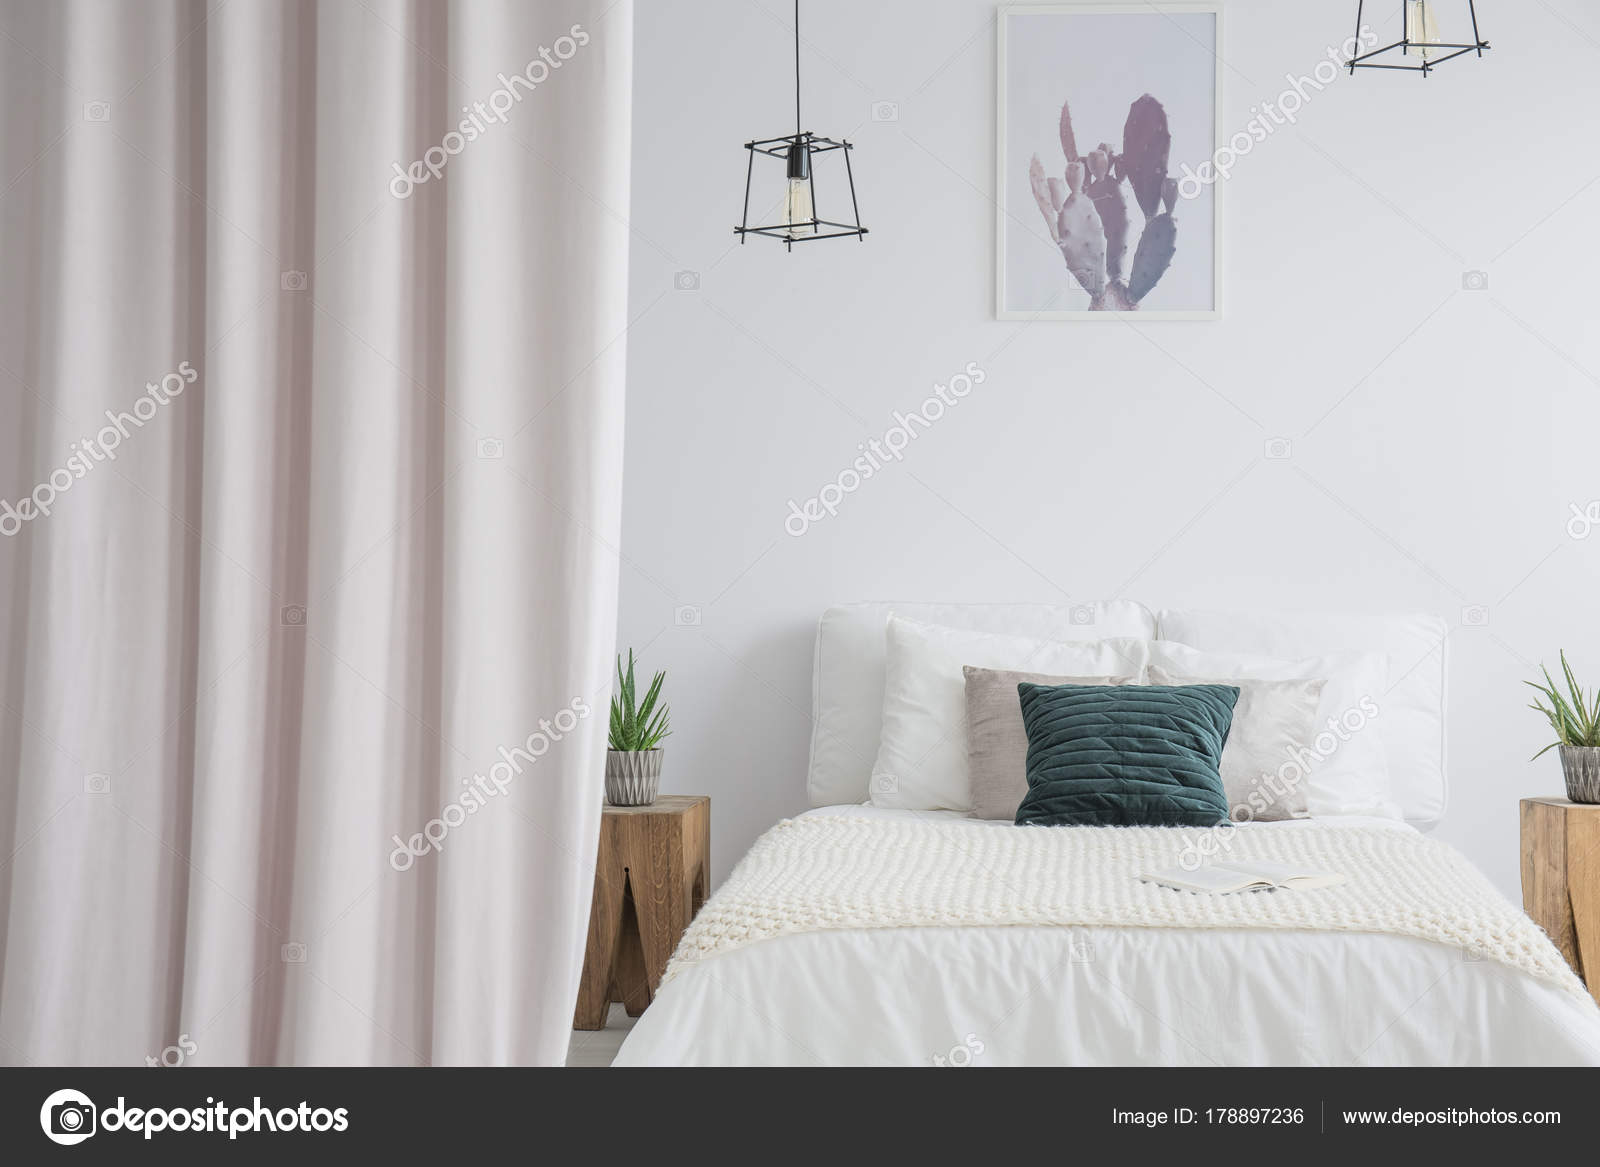 https://st3.depositphotos.com/2249091/17889/i/1600/depositphotos_178897236-stockafbeelding-pastel-gordijn-in-lichte-slaapkamer.jpg